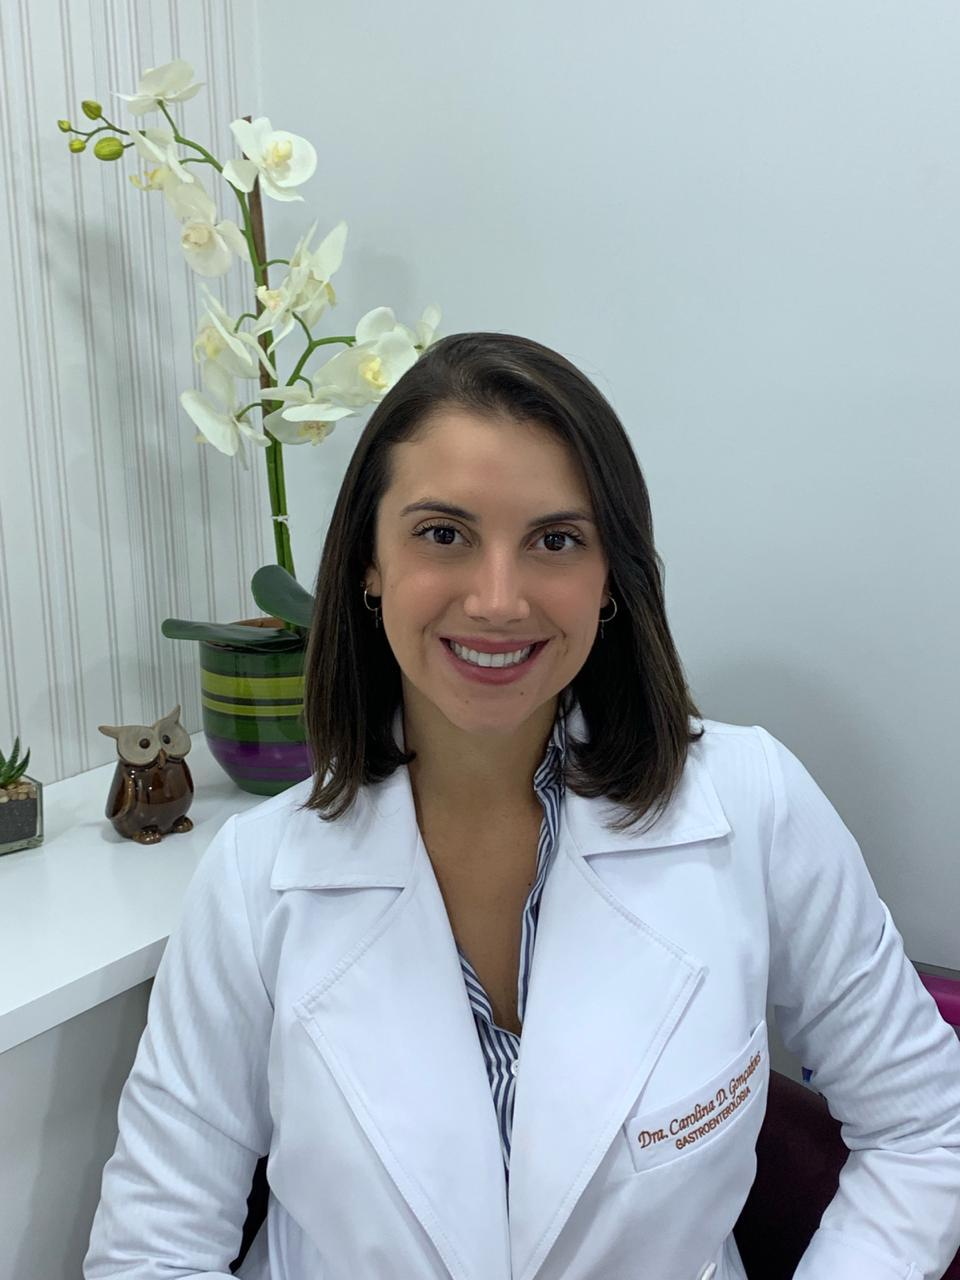 Carolina D. Gonçalves